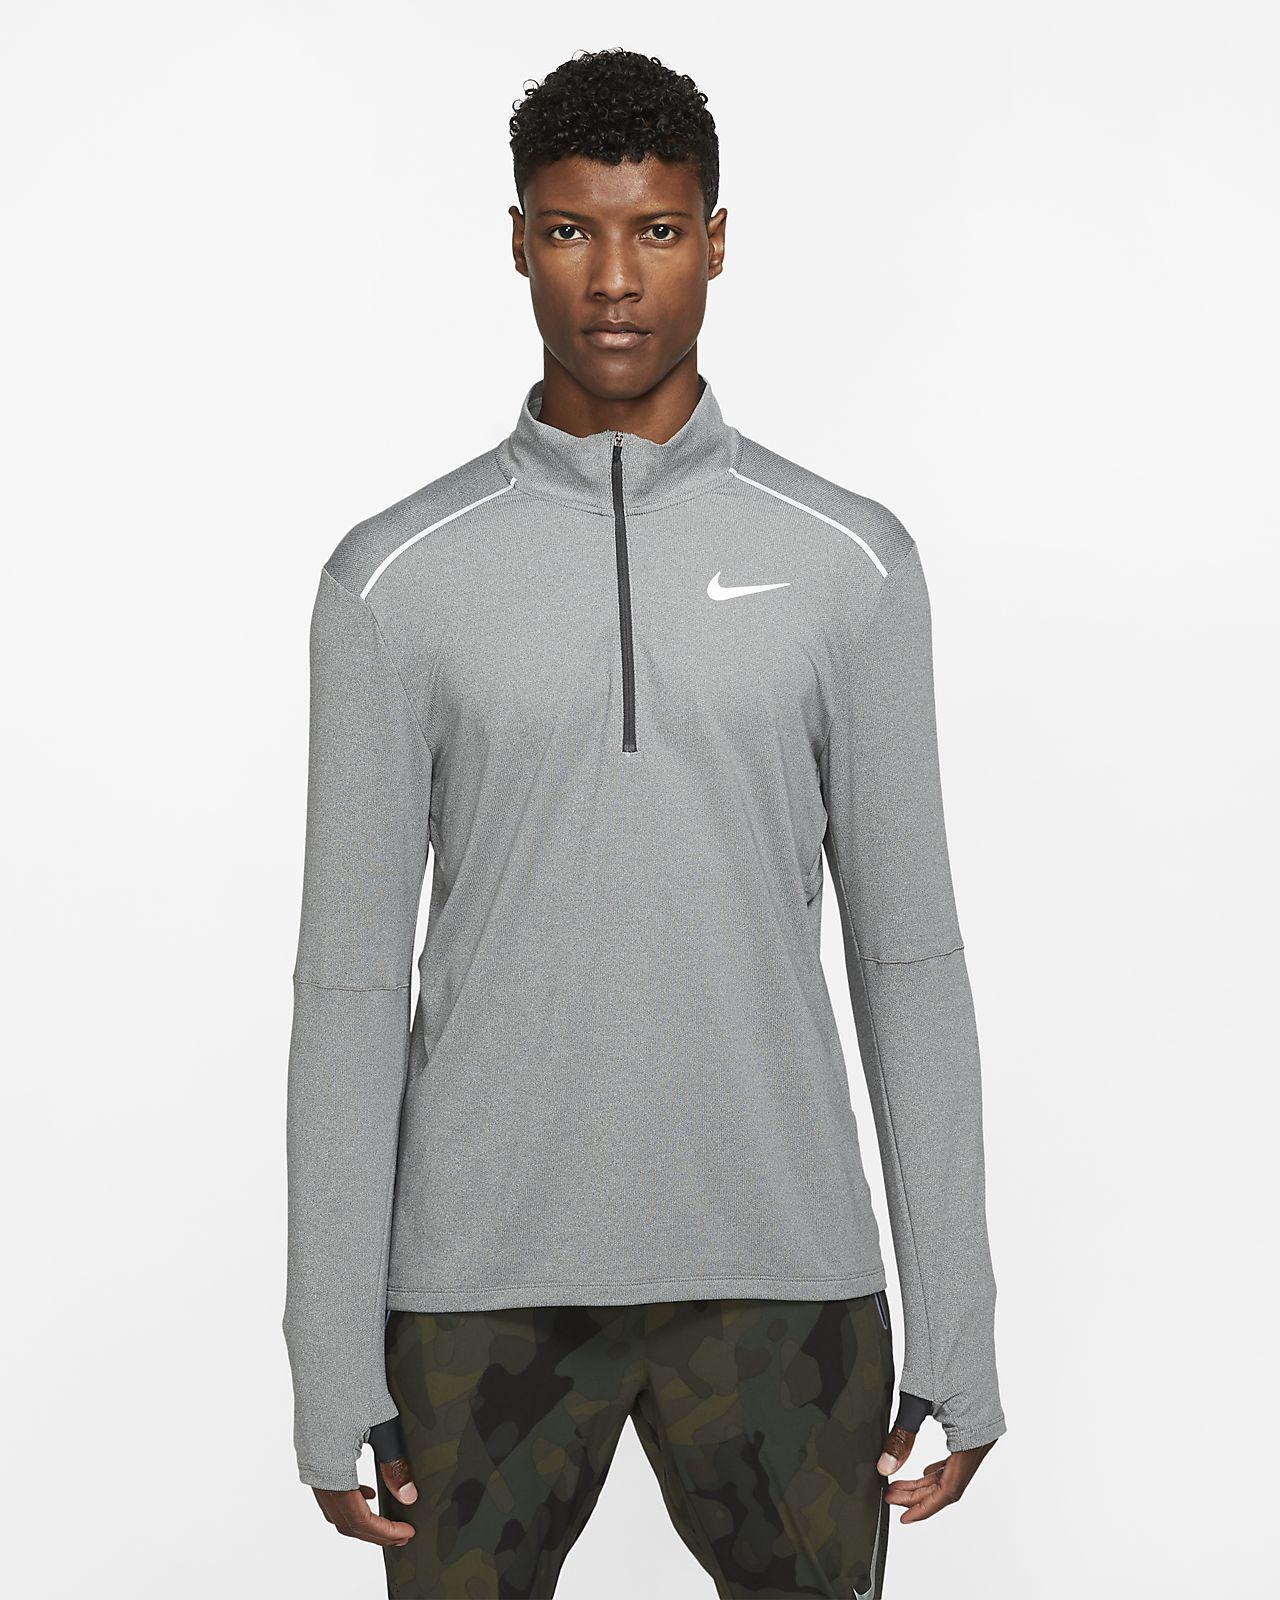 nike leggings mädchen, Nike – Running Dri FIT Element